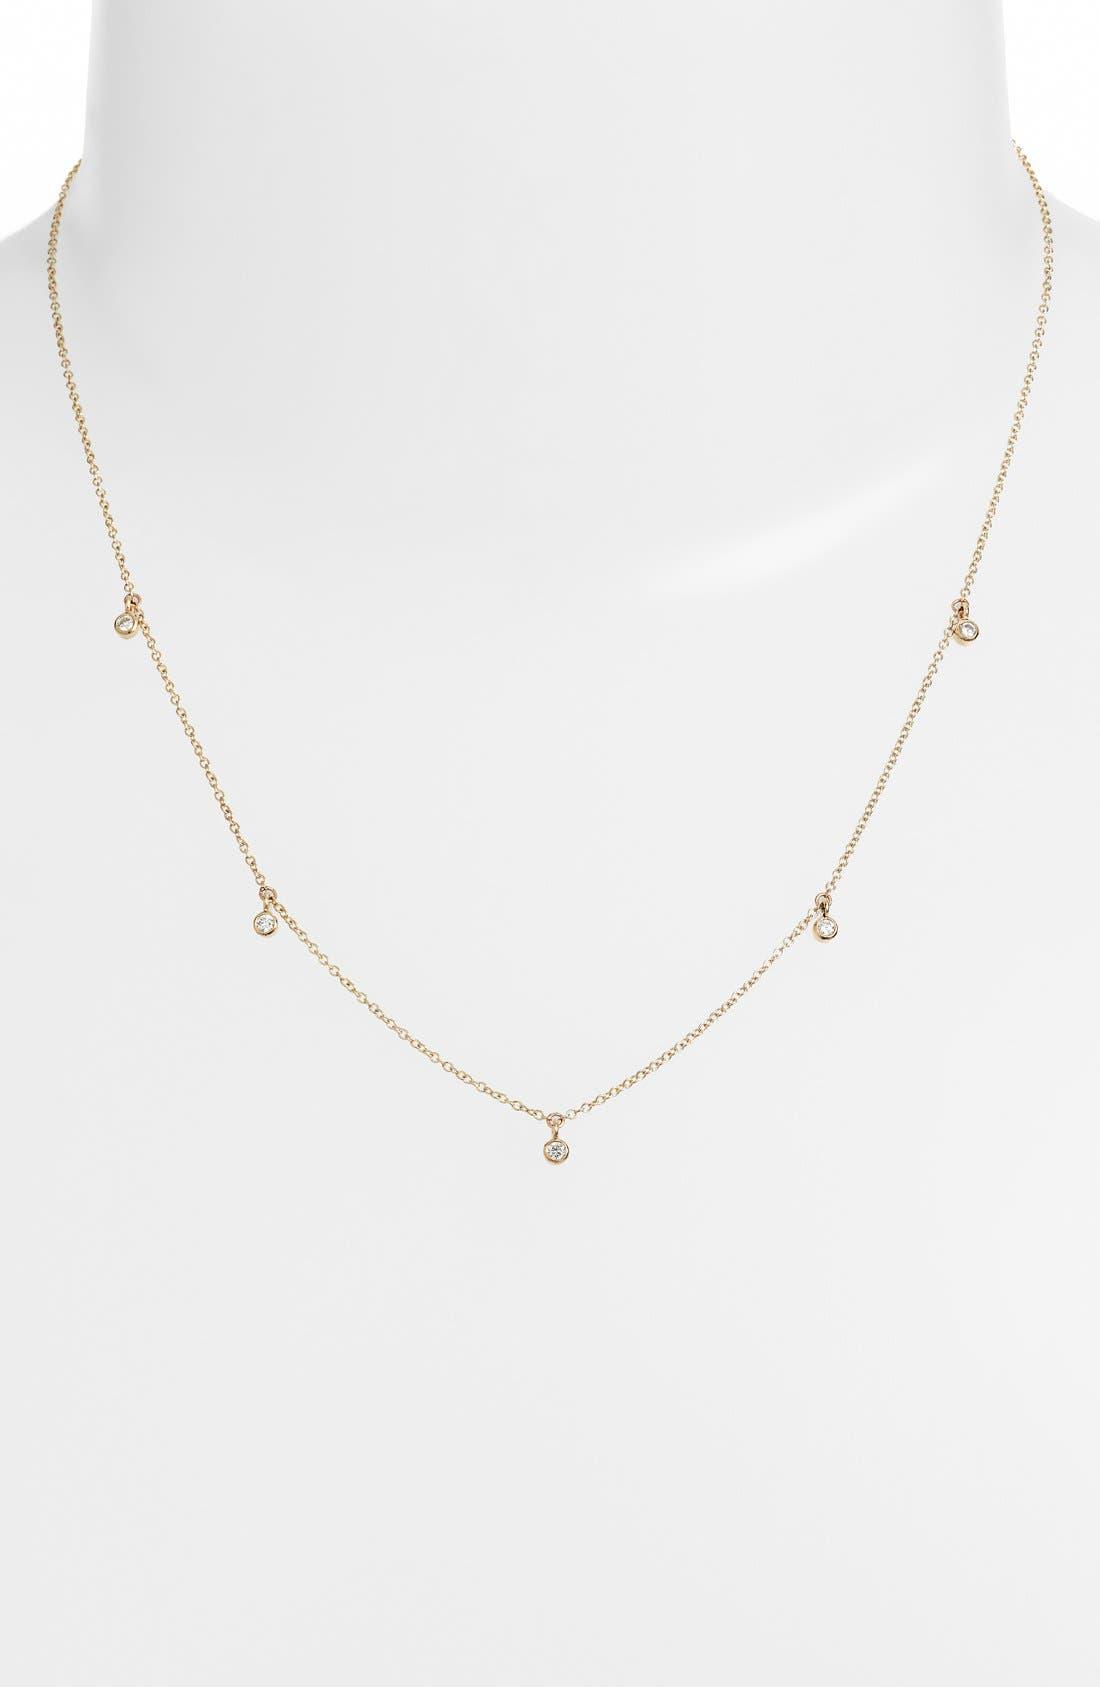 Main Image - Zoë Chicco Diamond Strand Necklace